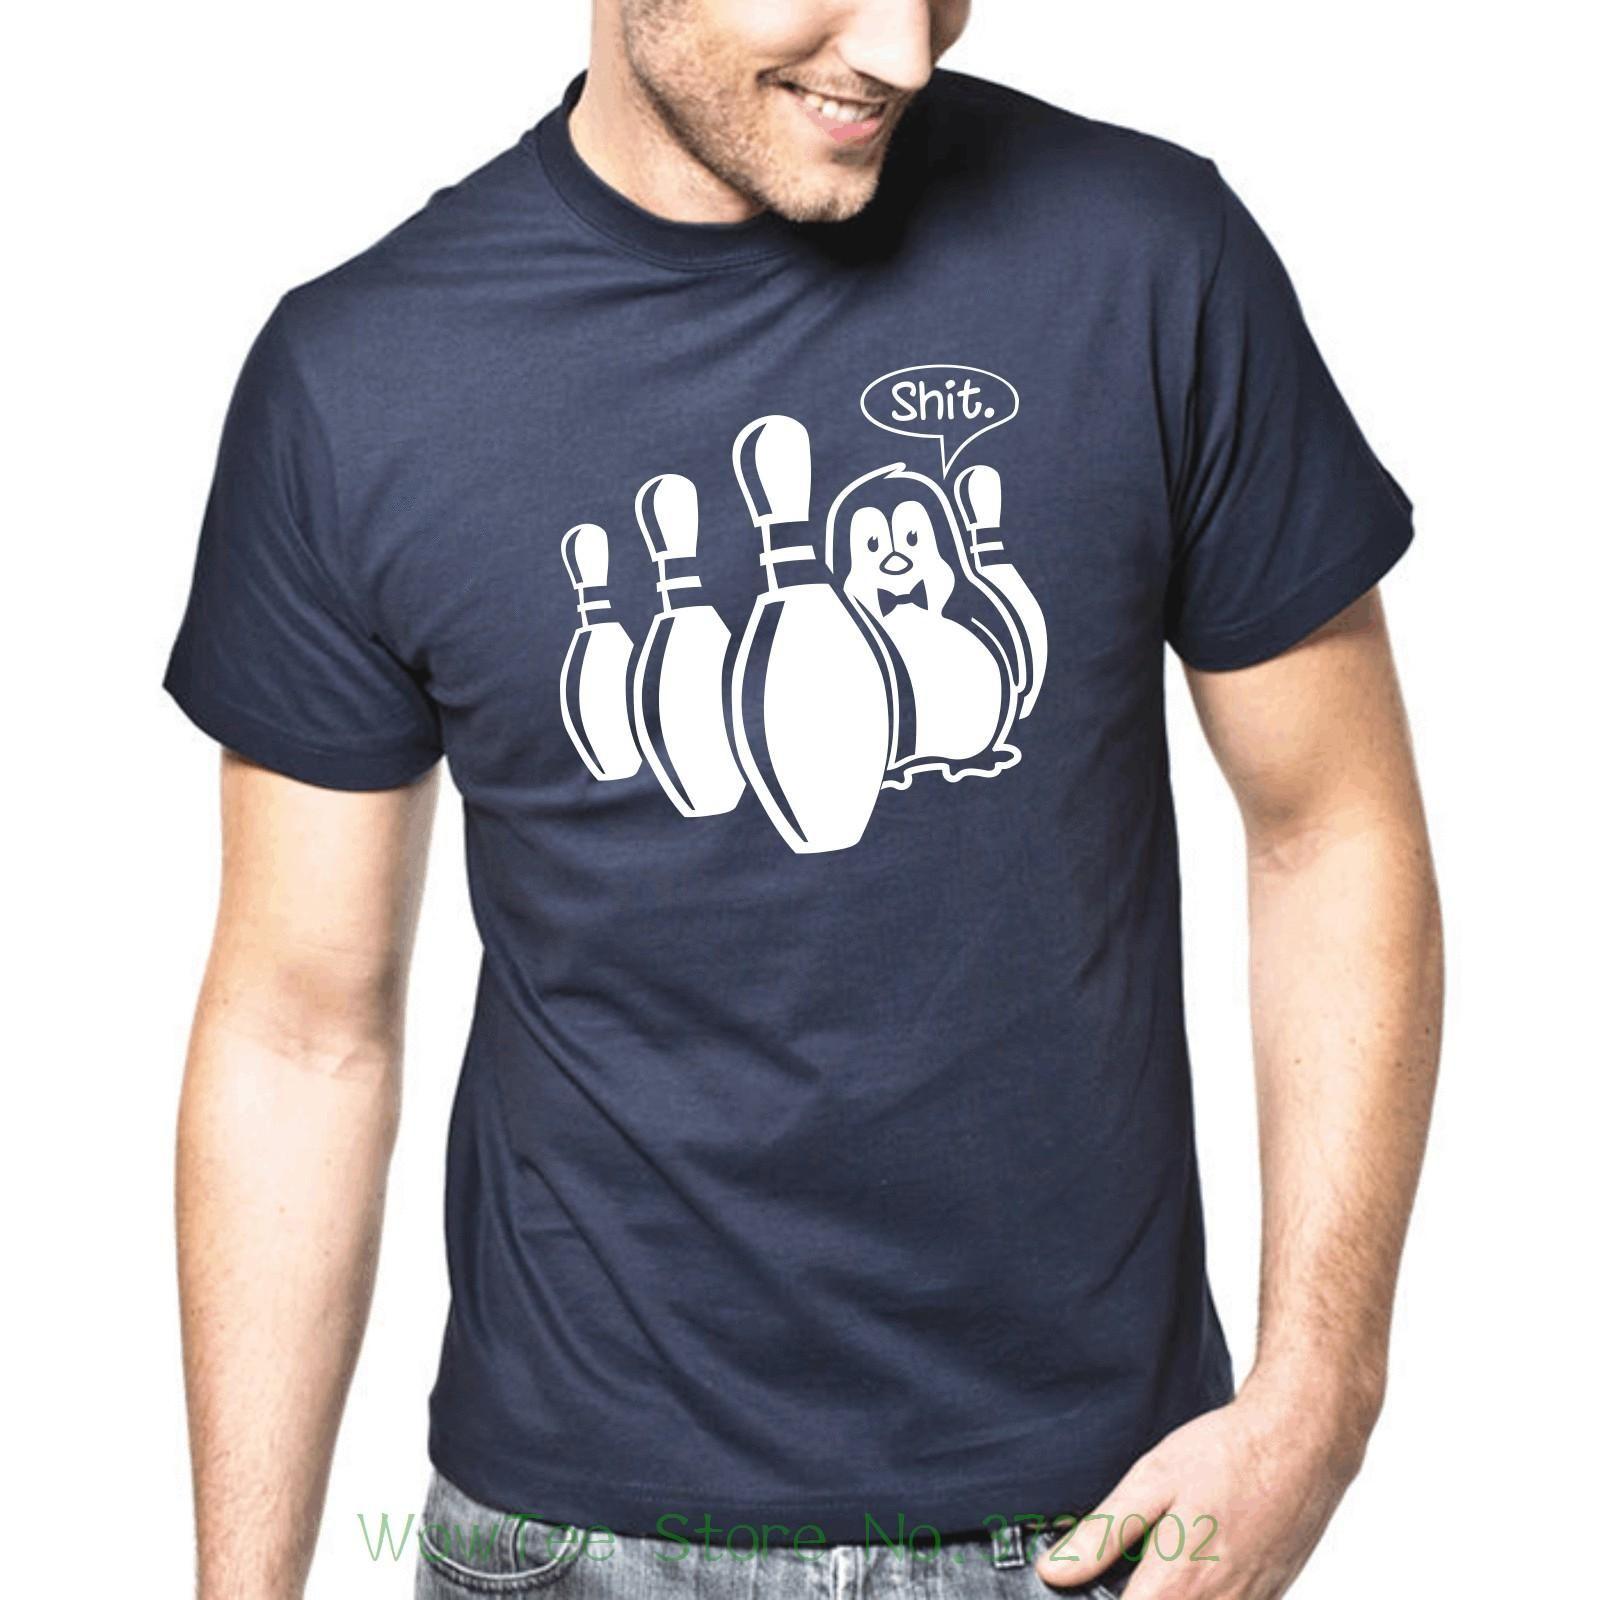 Pinguin Penguin Bowler Kegeln Fun Spruche S Xxl T Shirt Tshirt